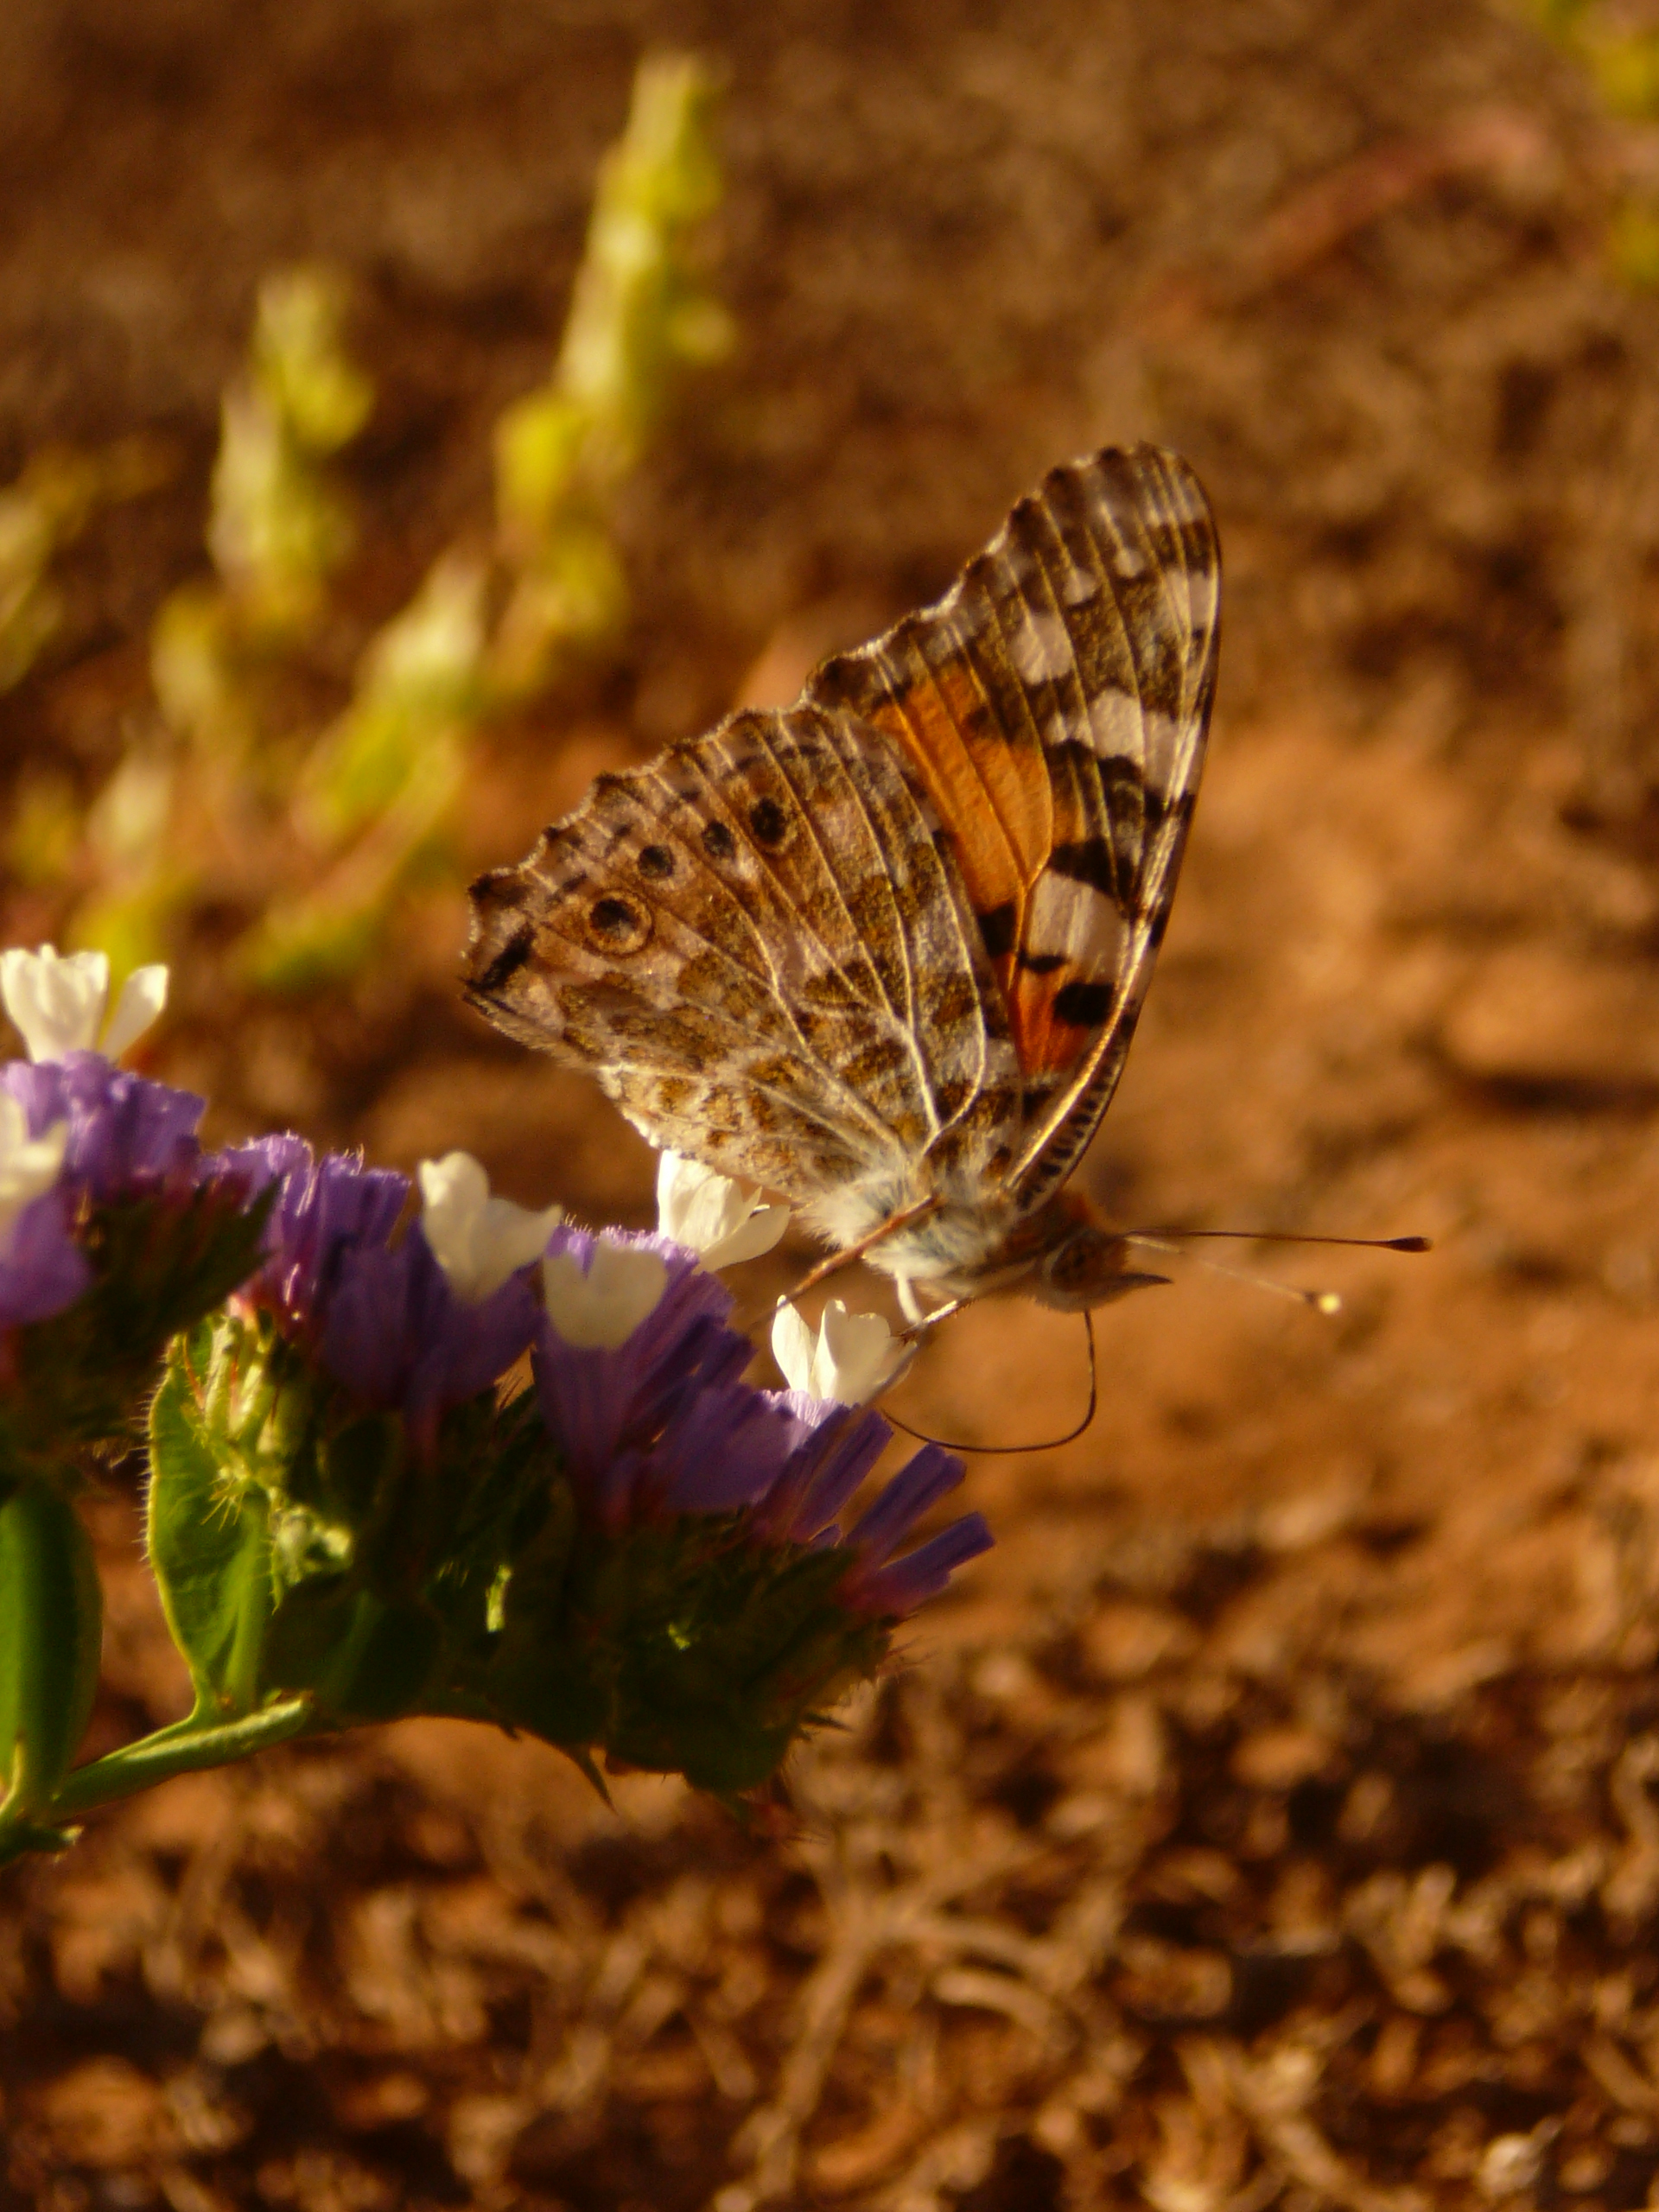 Tag 9 : Plage Aglou - El Aaiún - Flora und Fauna